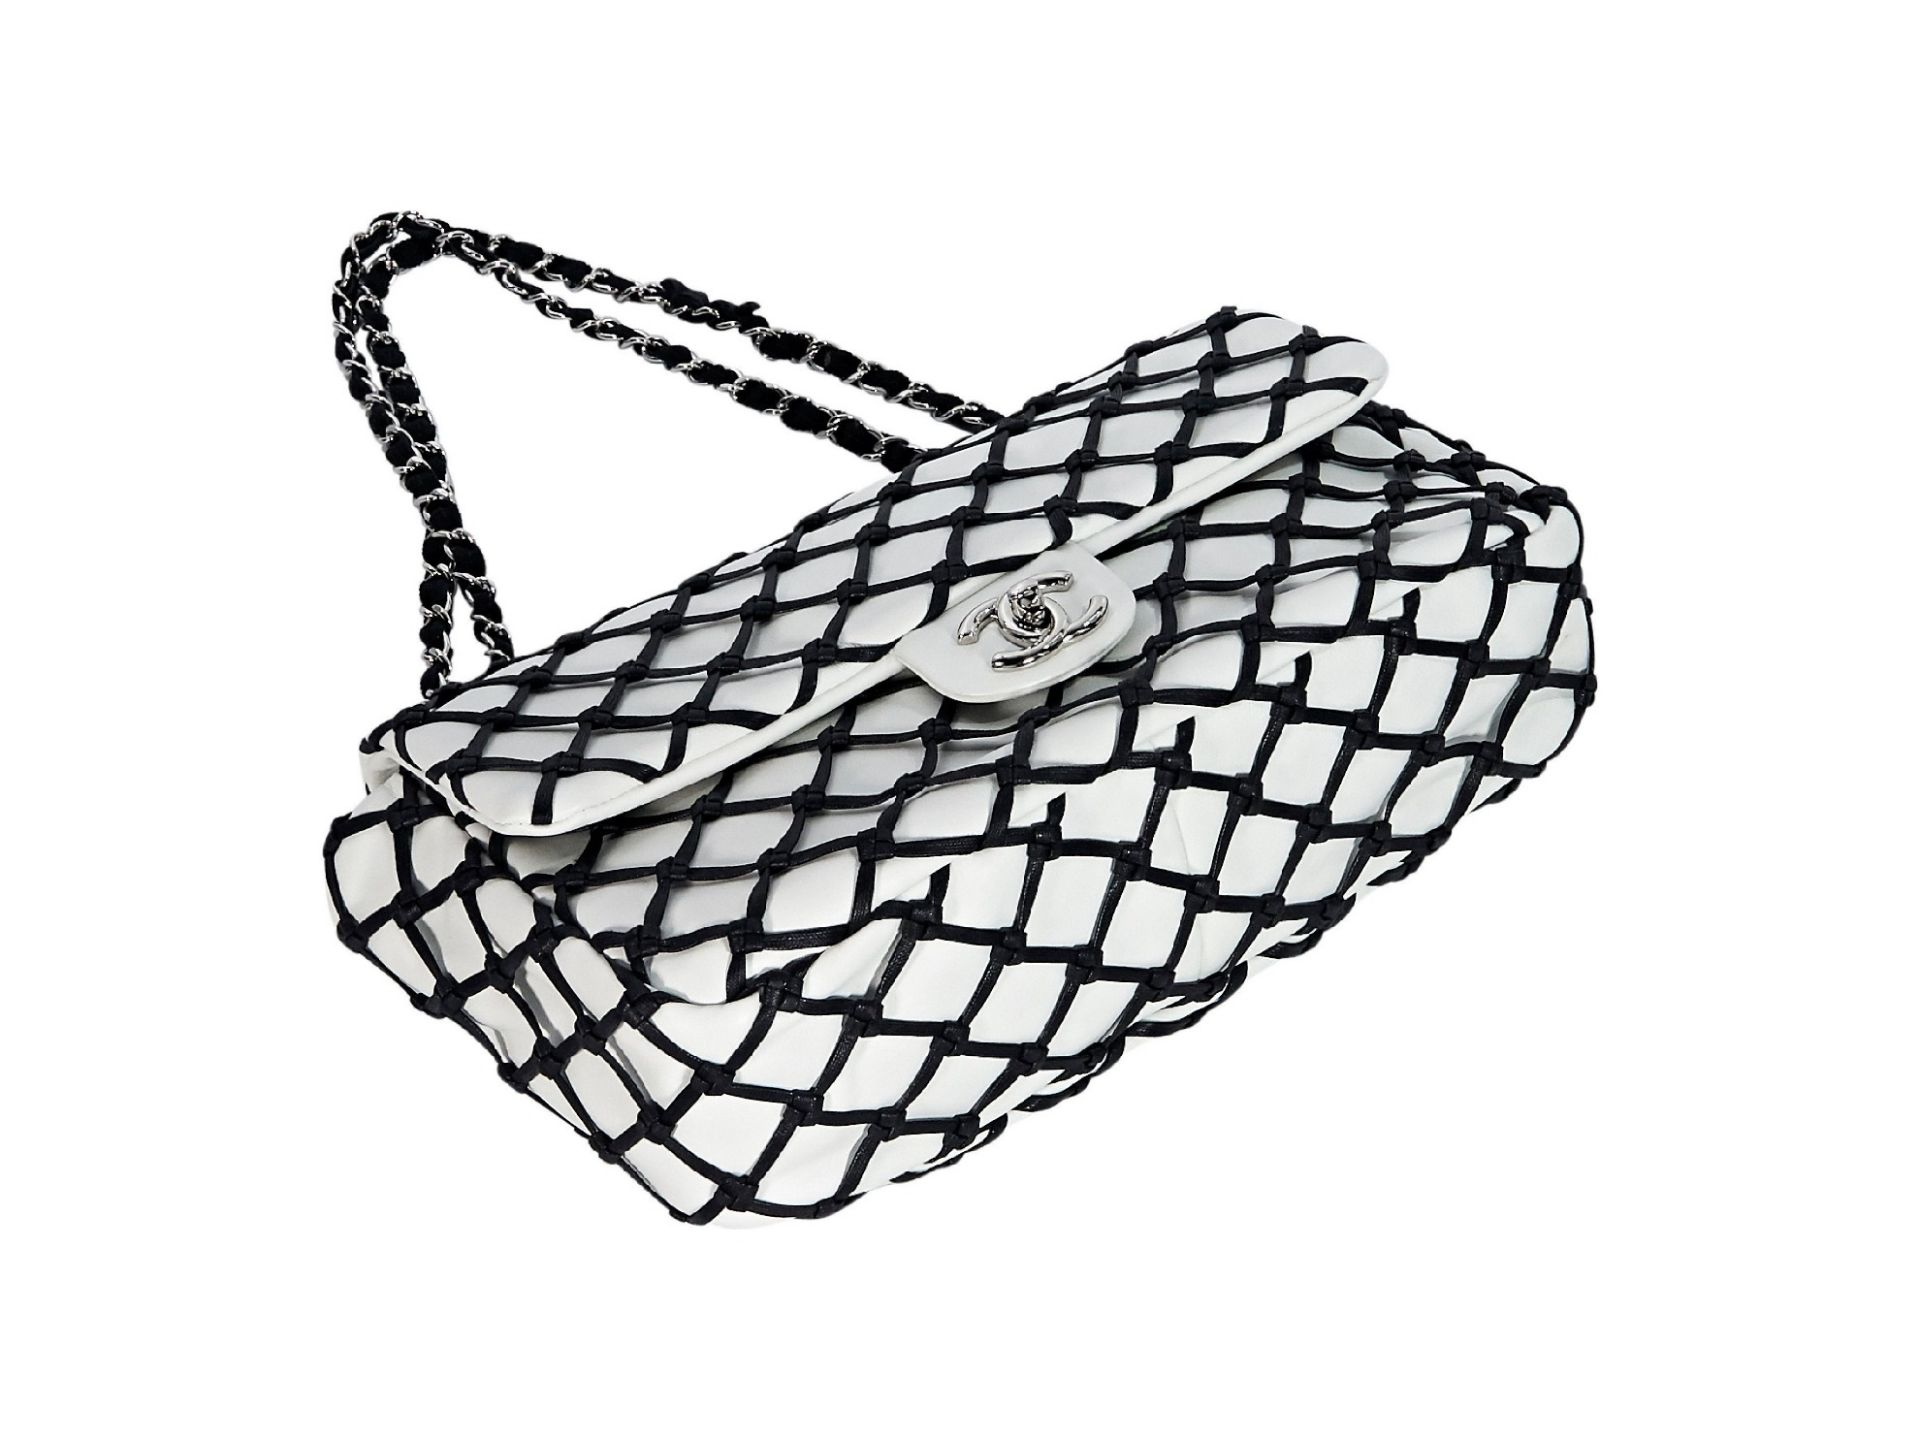 White & Black Chanel 2011 Canebiers Jumbo Flap Bag